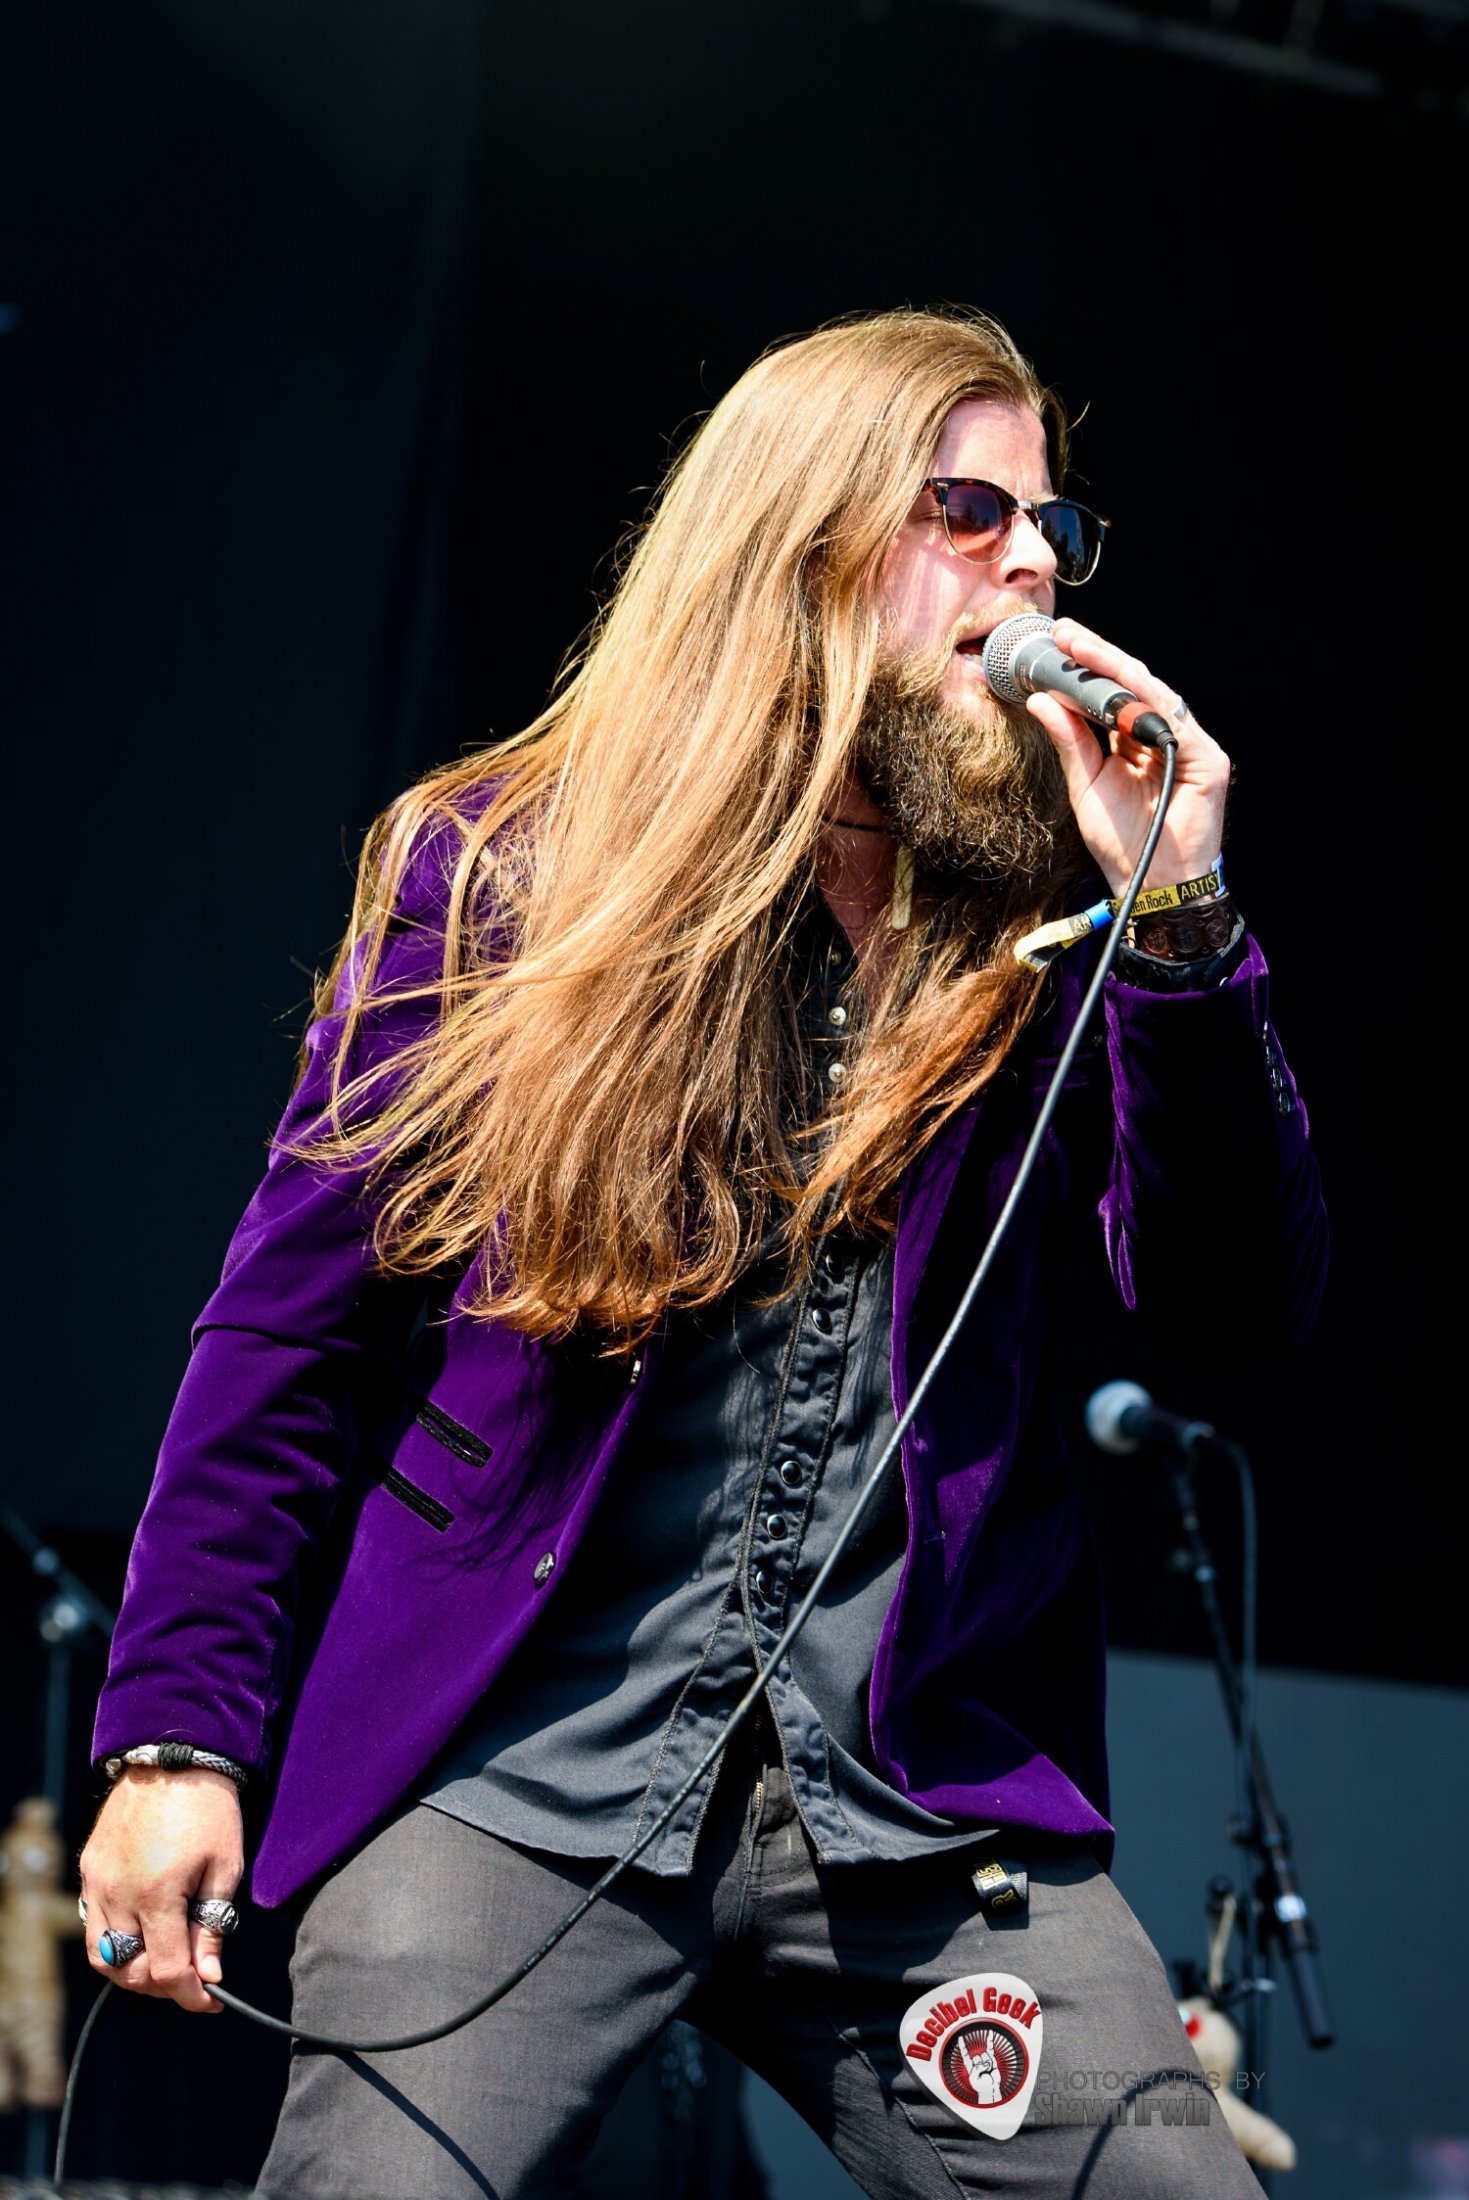 James Holkworth The Coolbenders #19-Sweden Rock 2019-Shawn Irwin